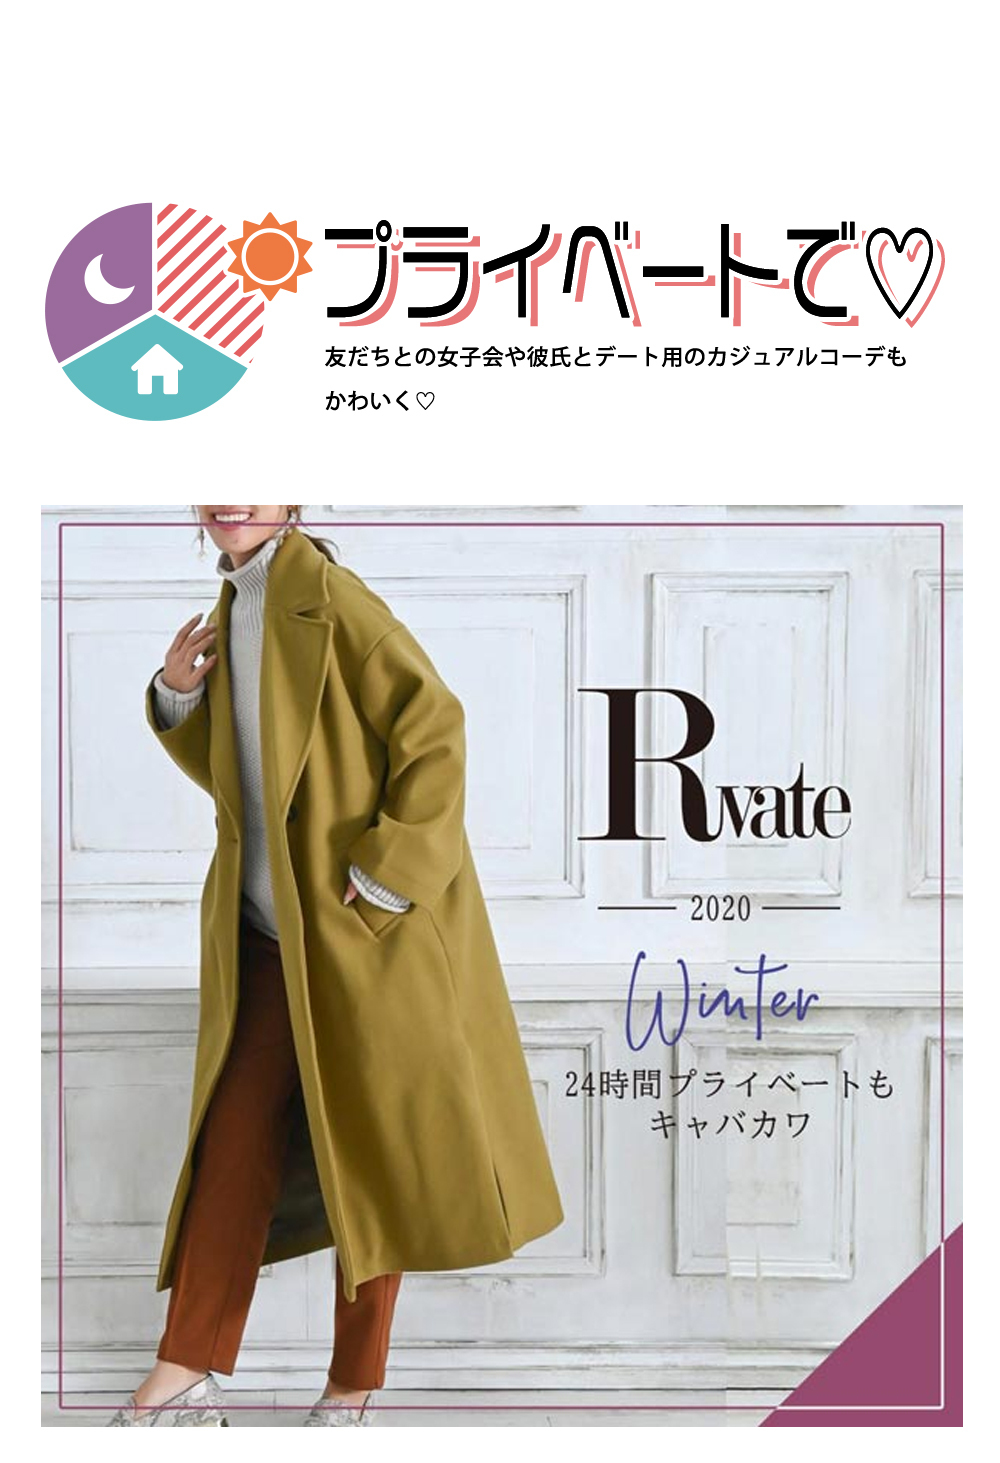 Rew-You徹底解剖マニュアル